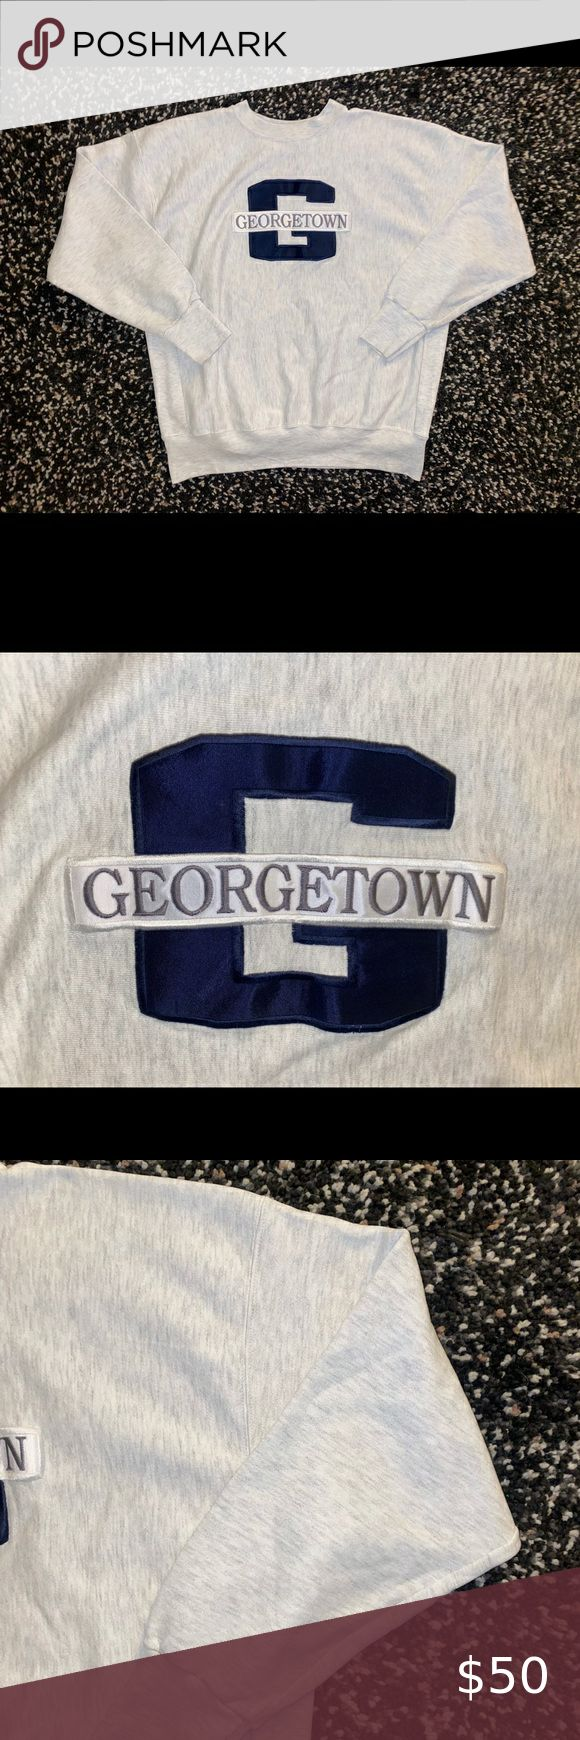 Vintage Georgetown Hoyas Crewneck Sweatshirt Xl Vintage Georgetown Hoyas Crewneck Sweatshirt Stitched Logo Me Crew Neck Sweatshirt Sweatshirts Sweatshirt Shirt [ 1740 x 580 Pixel ]